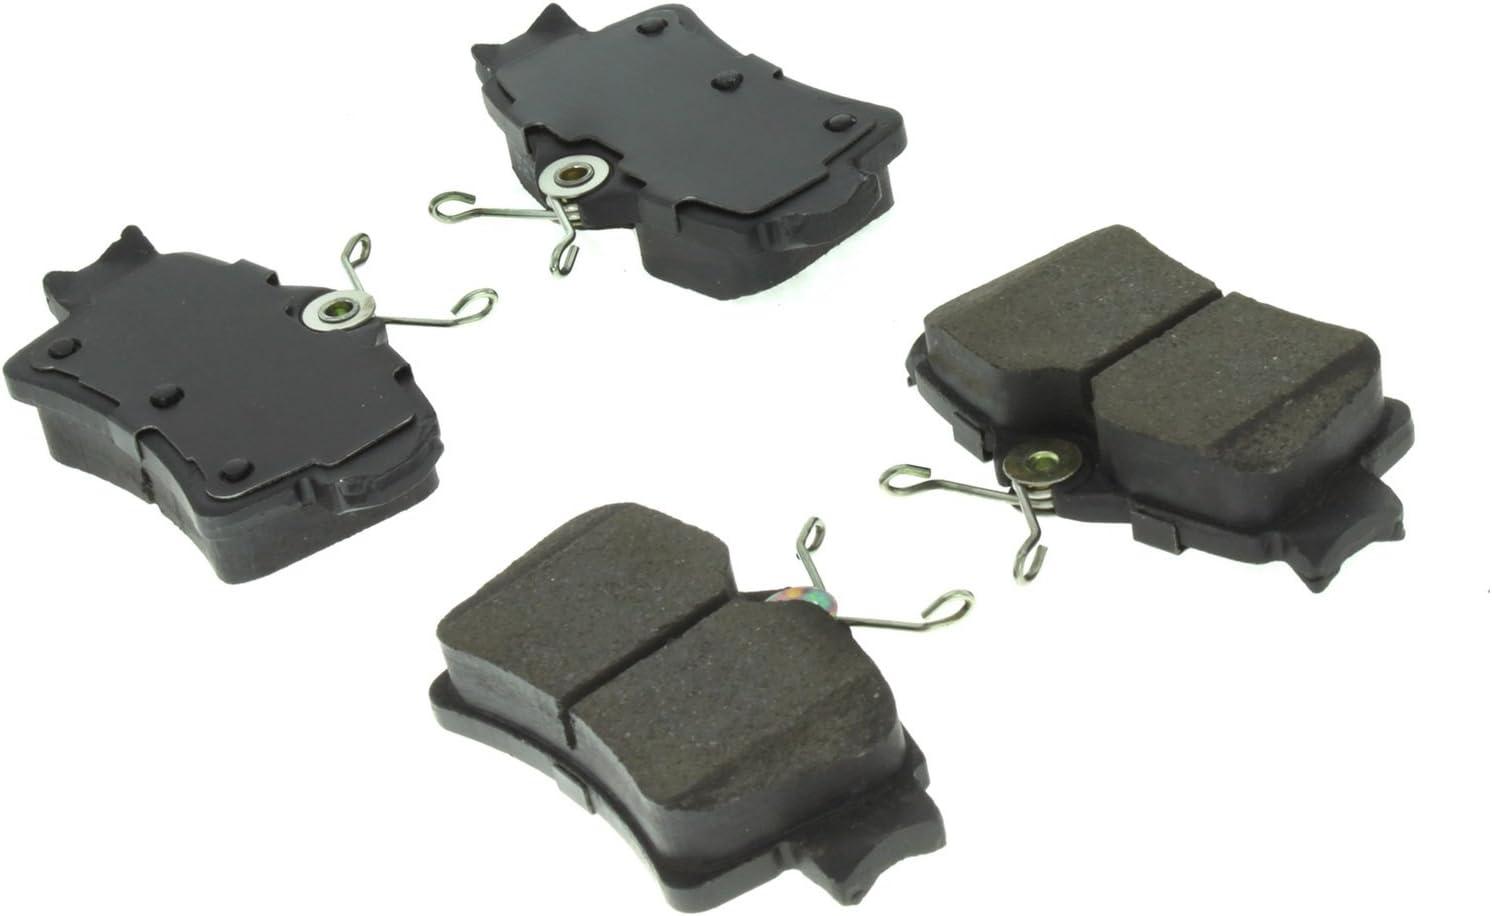 StopTech 309.06080 Street Performance Rear Brake Pad